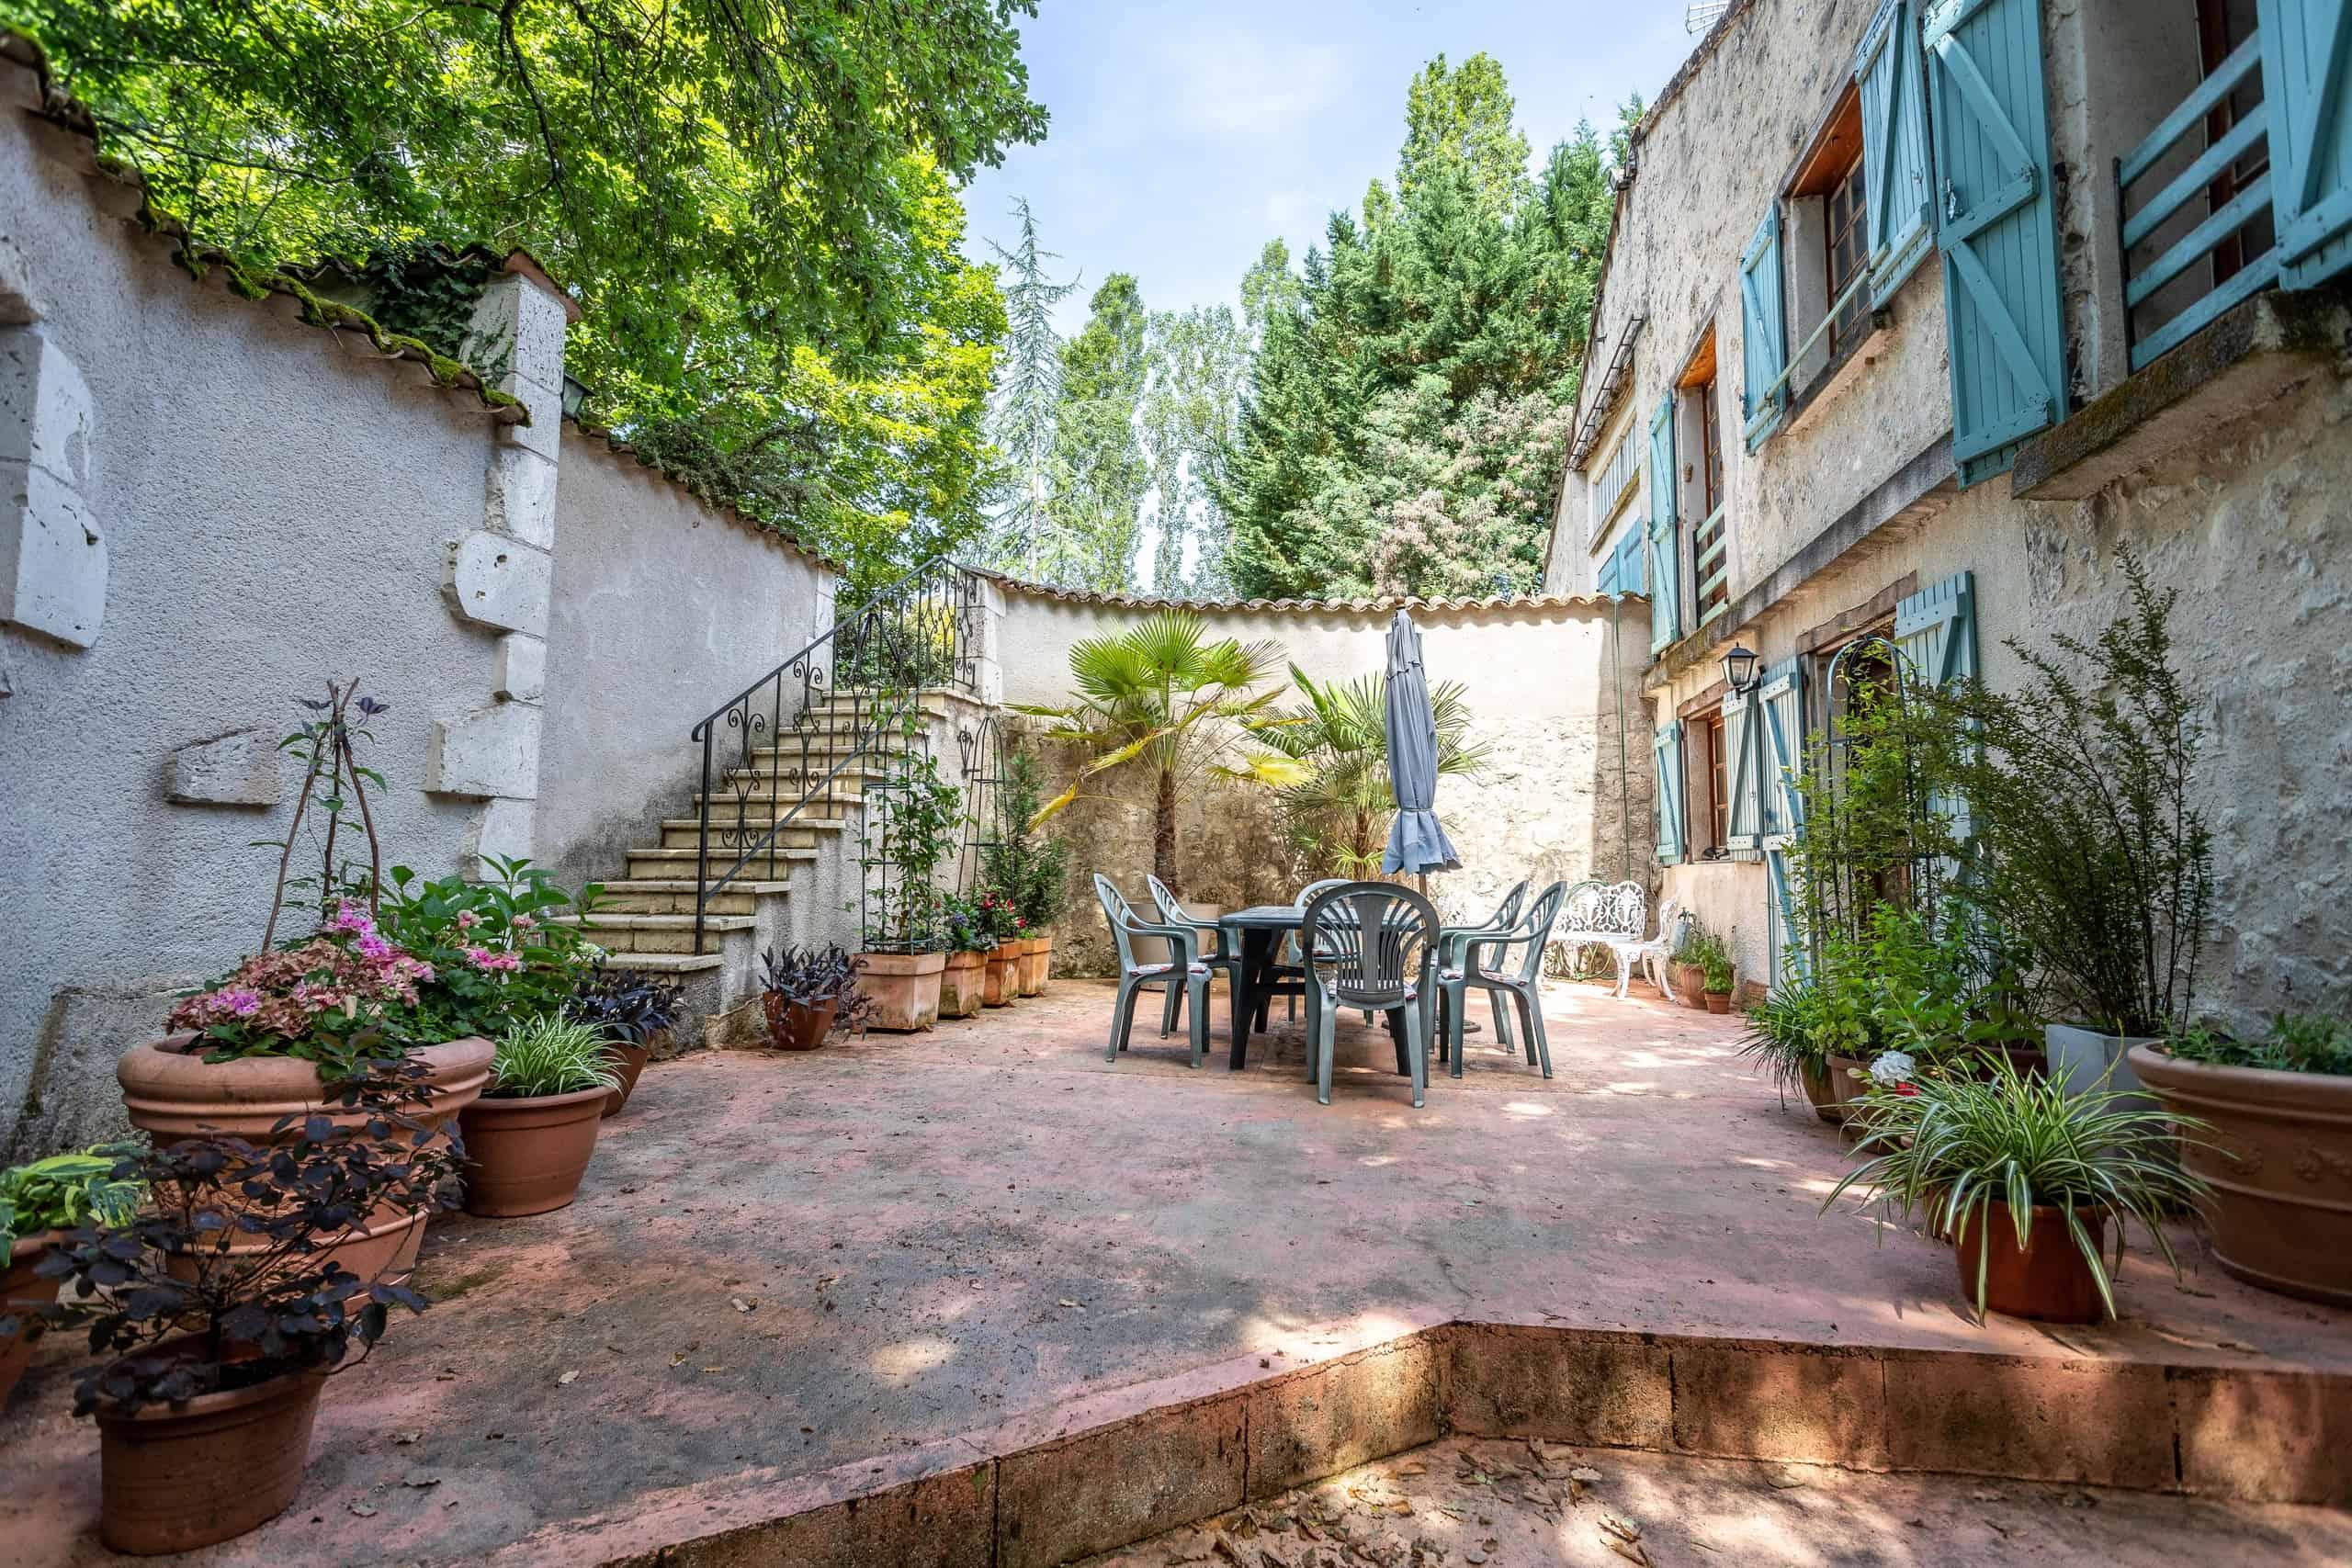 Courtyard-WMC080